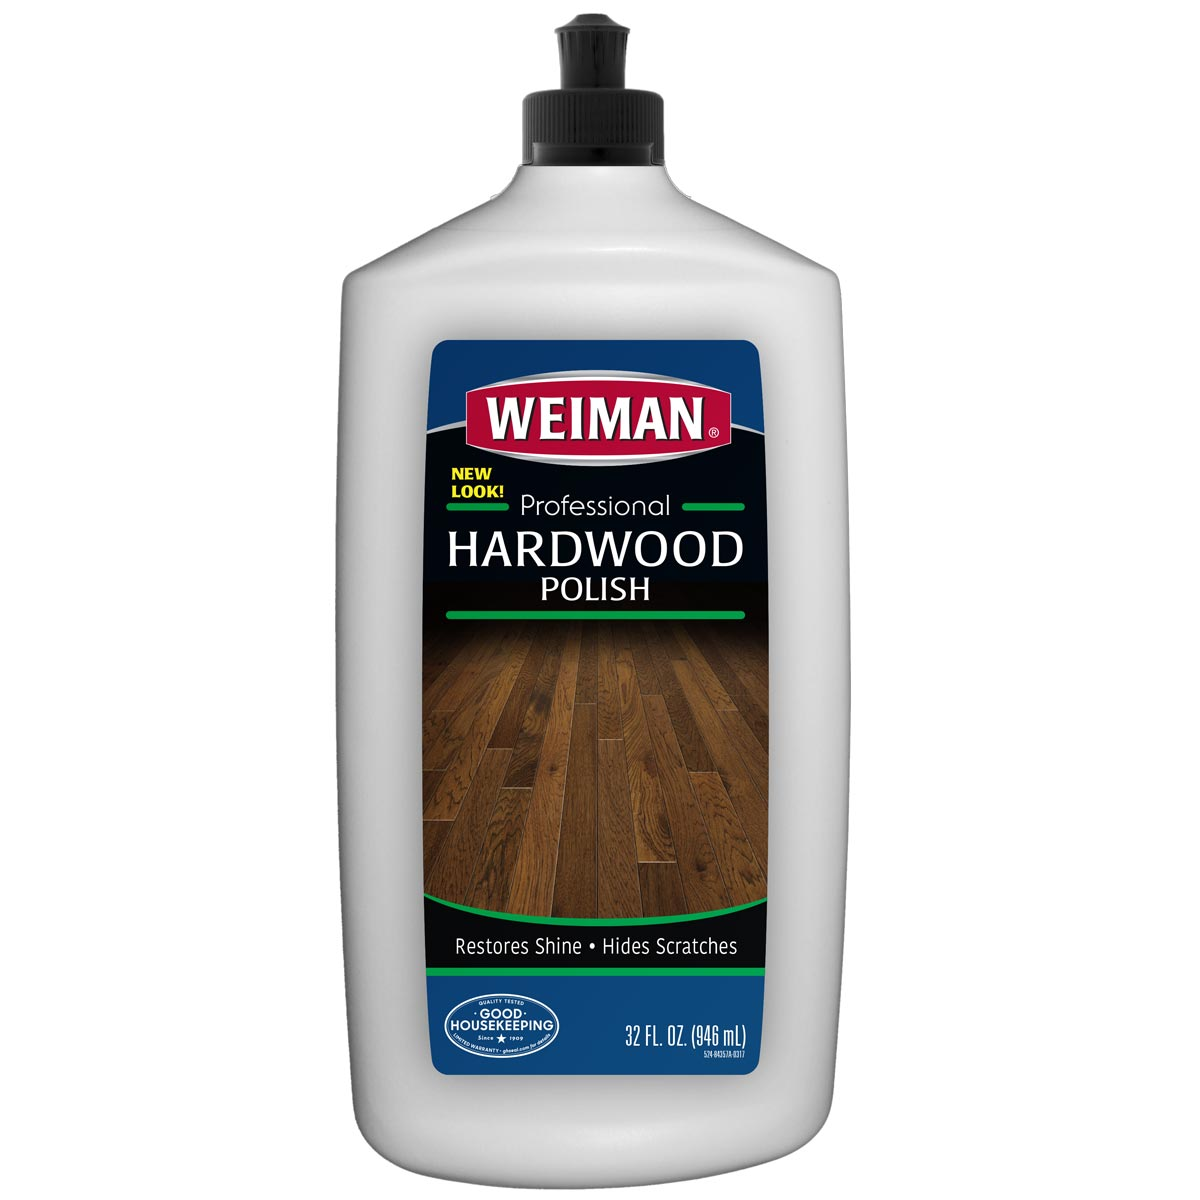 https://googone.com/media/catalog/product/w/e/weiman-hardwood-floor-polish_front.jpg